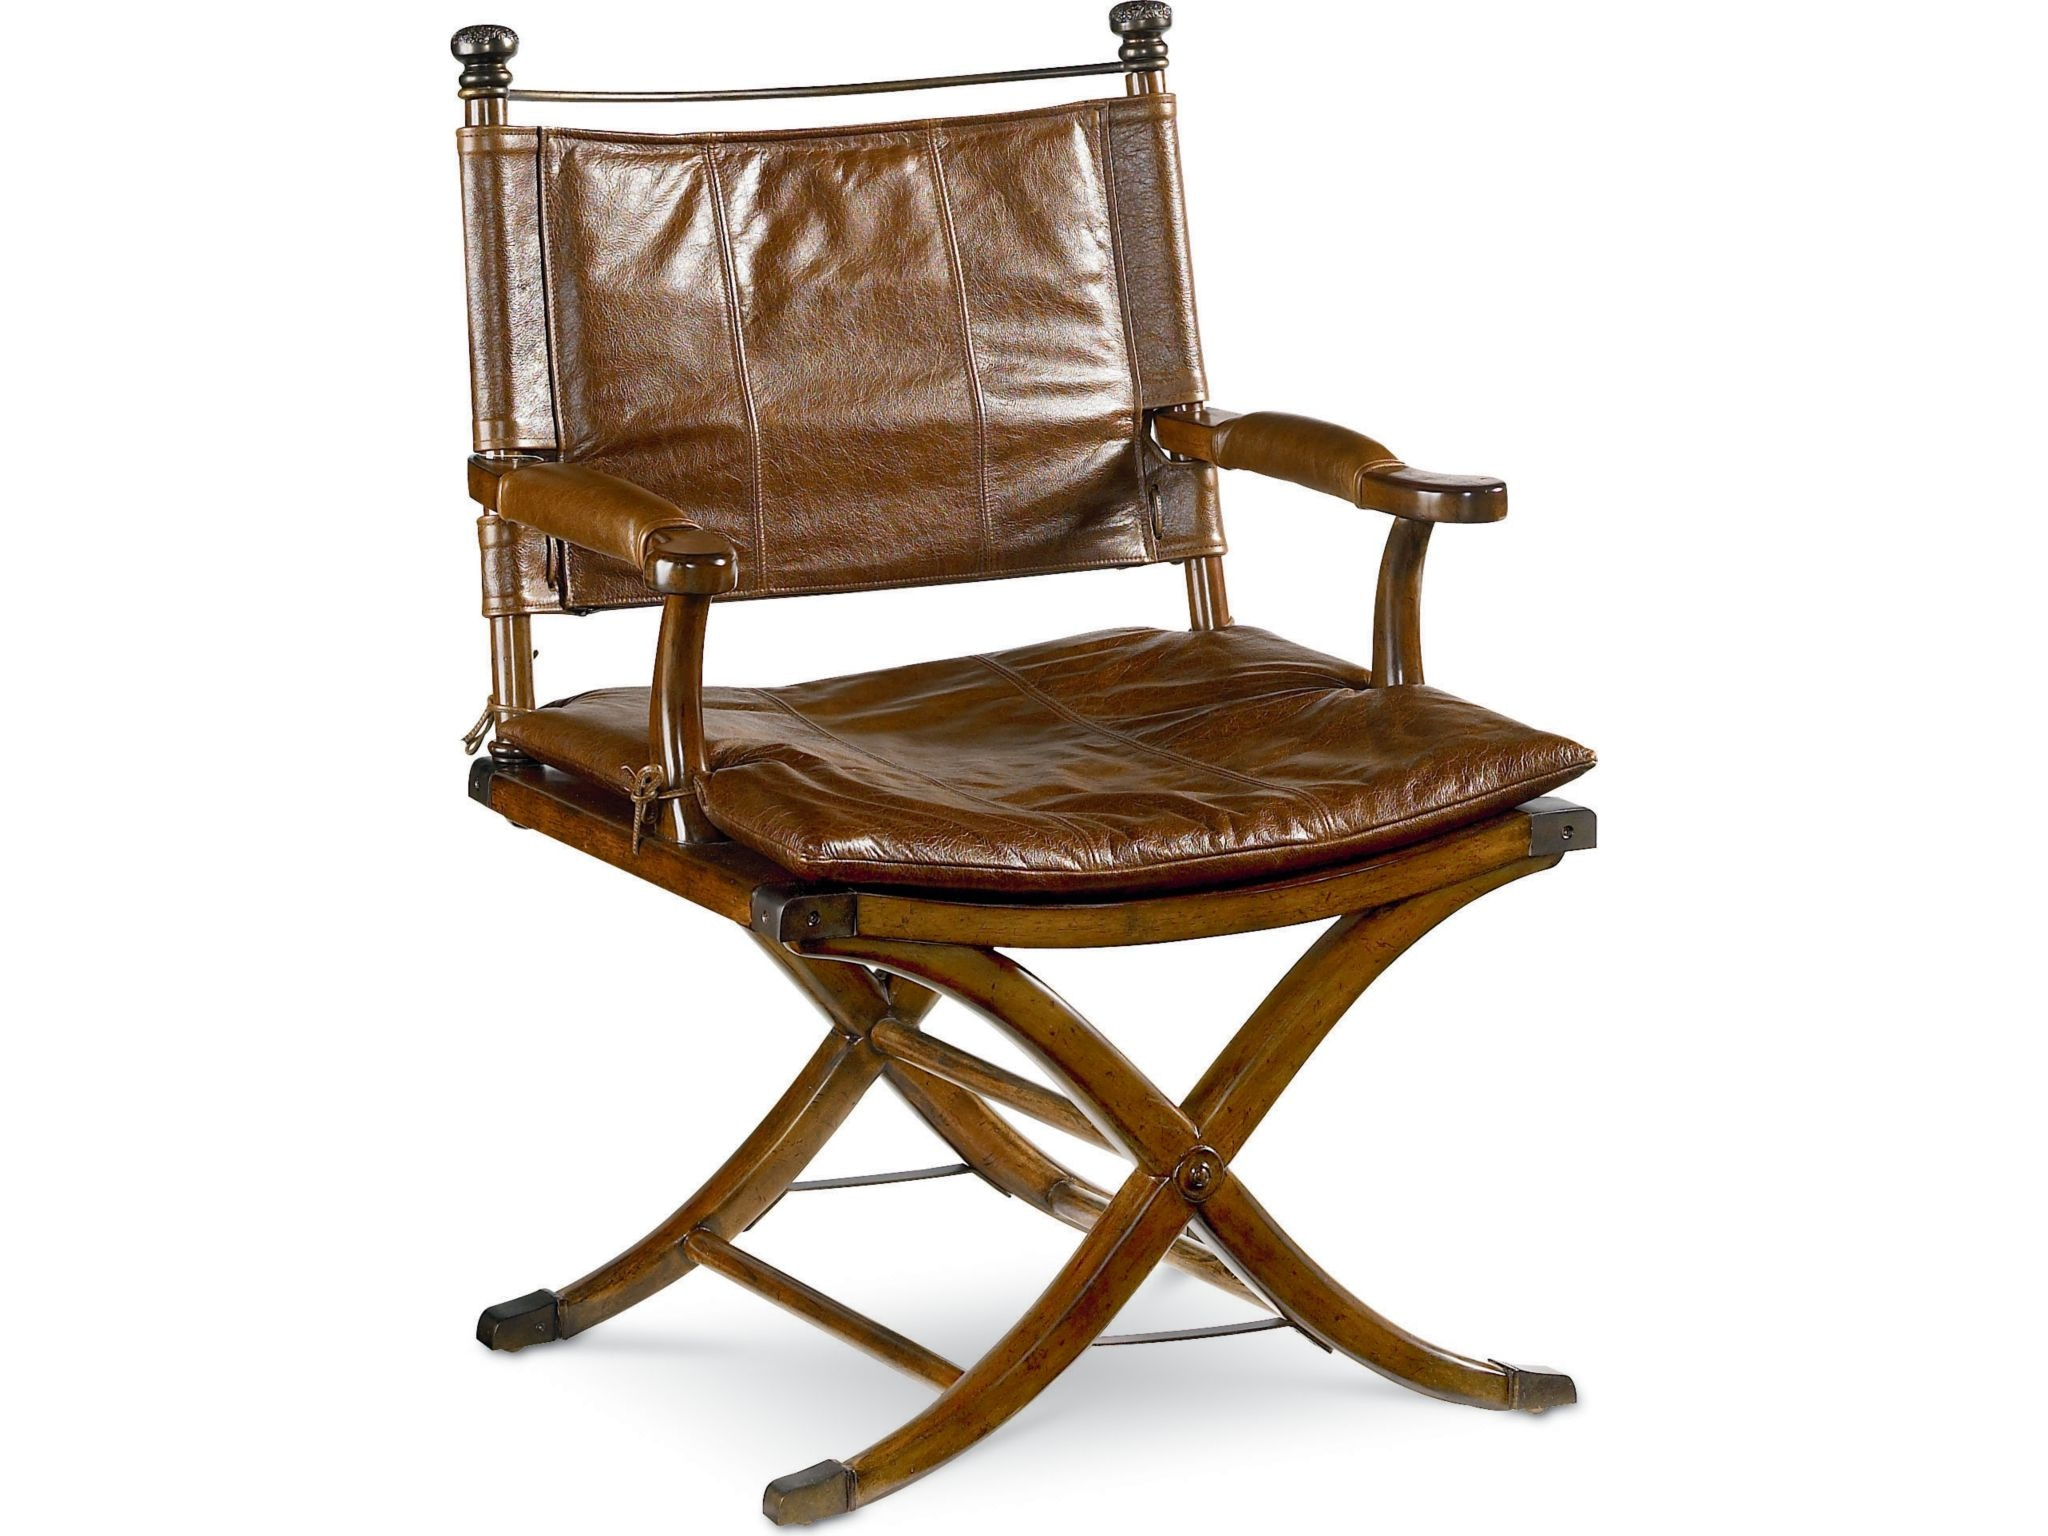 Thomasville Home Office Safari Desk Chair 46291 908